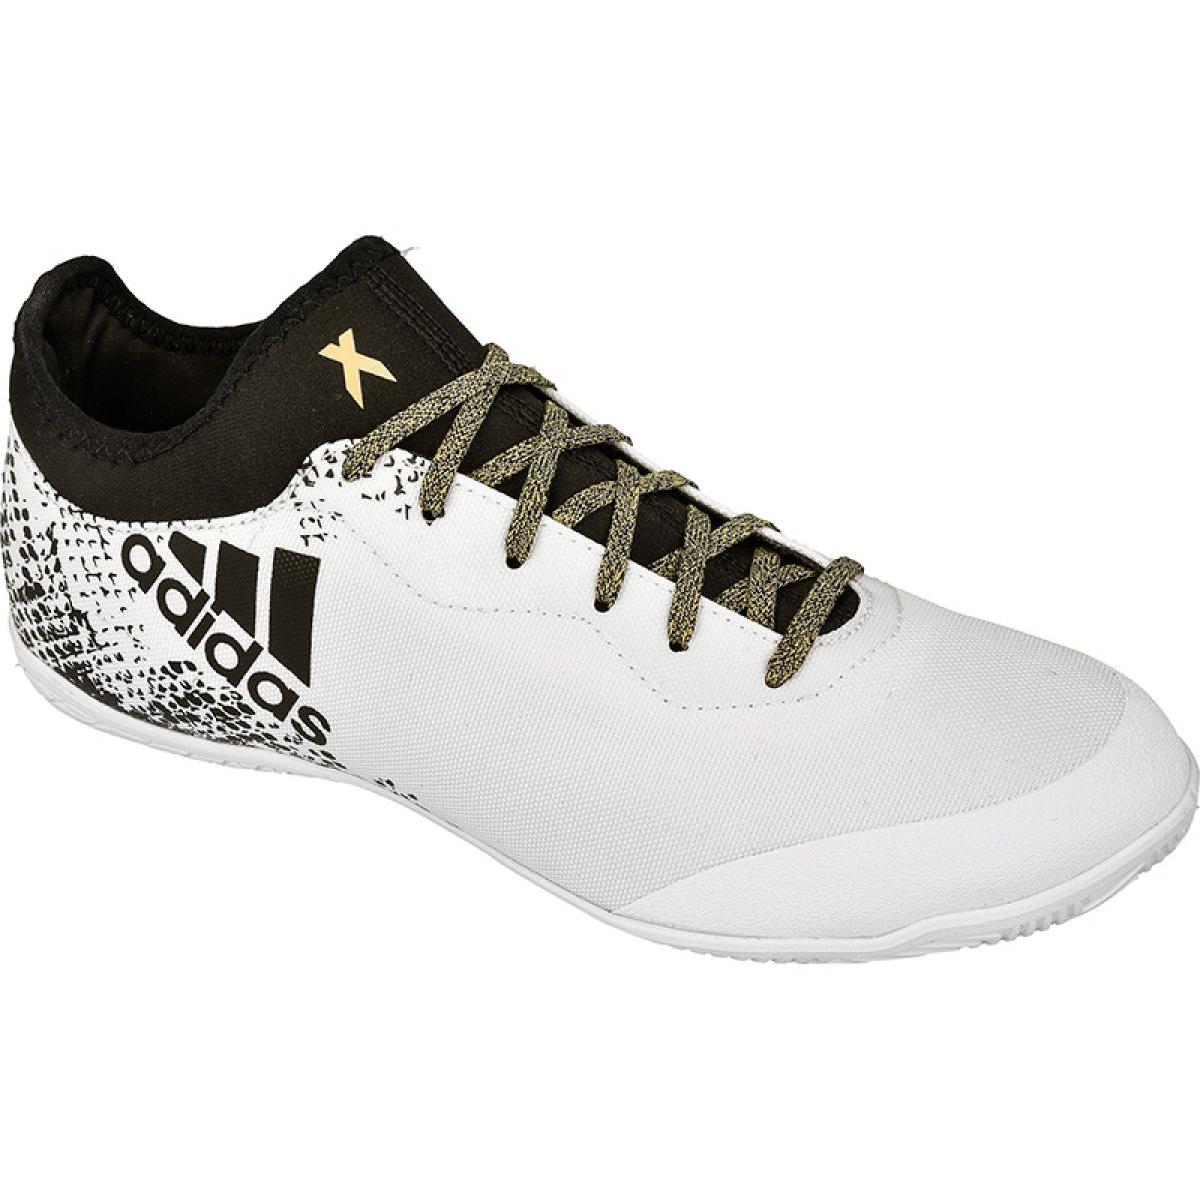 Folleto consumidor desierto  Adidas X 16.3 Court M In S79705 indoor shoes white white - ButyModne.pl